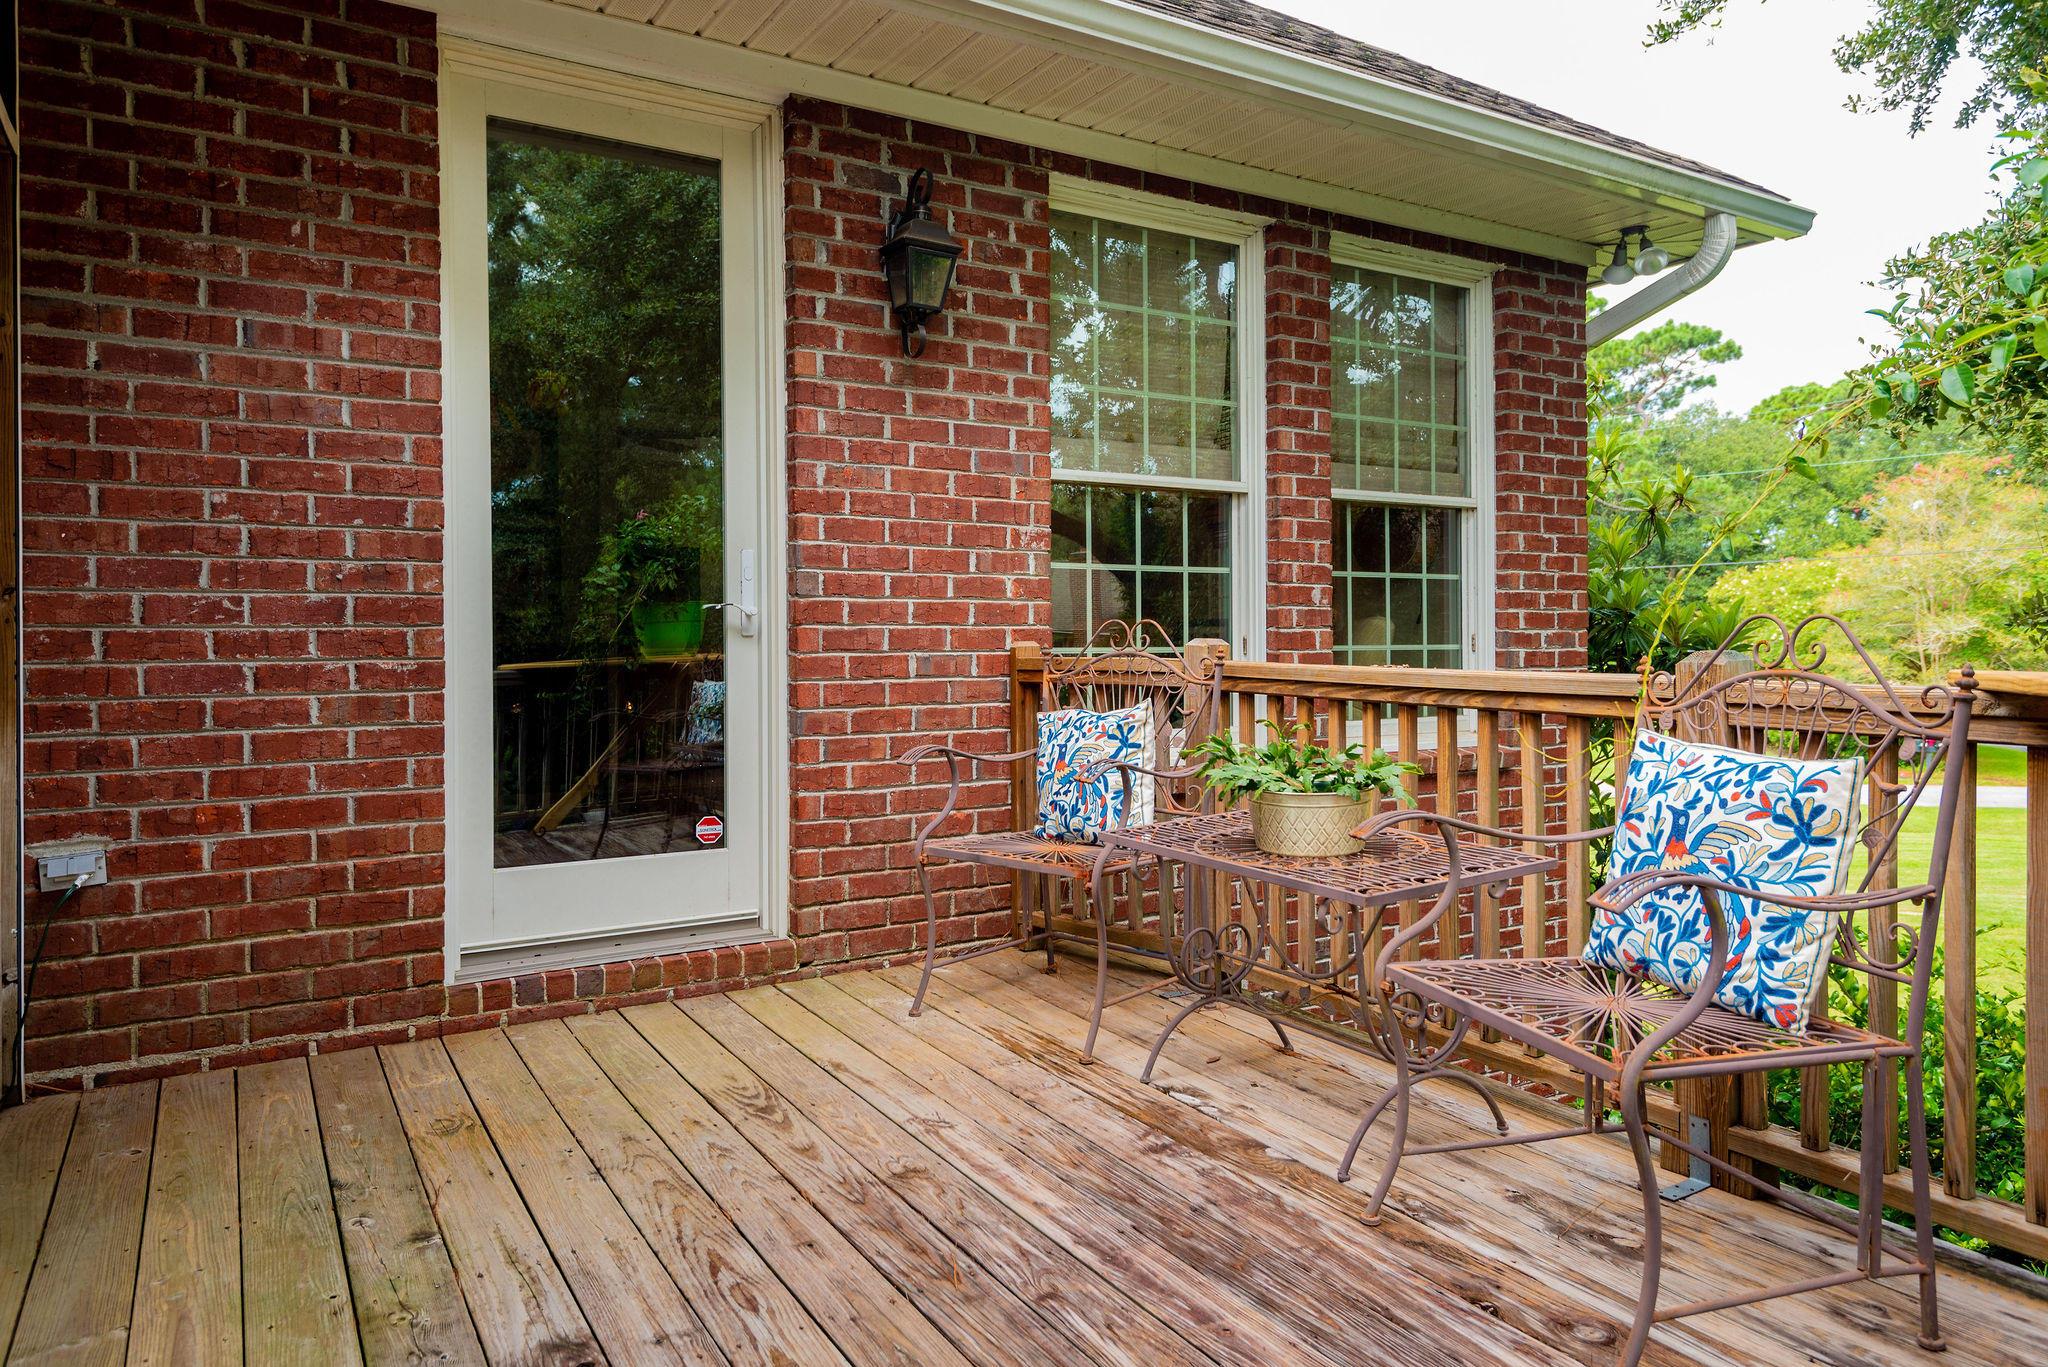 Country Club II Homes For Sale - 1482 Burningtree, Charleston, SC - 37